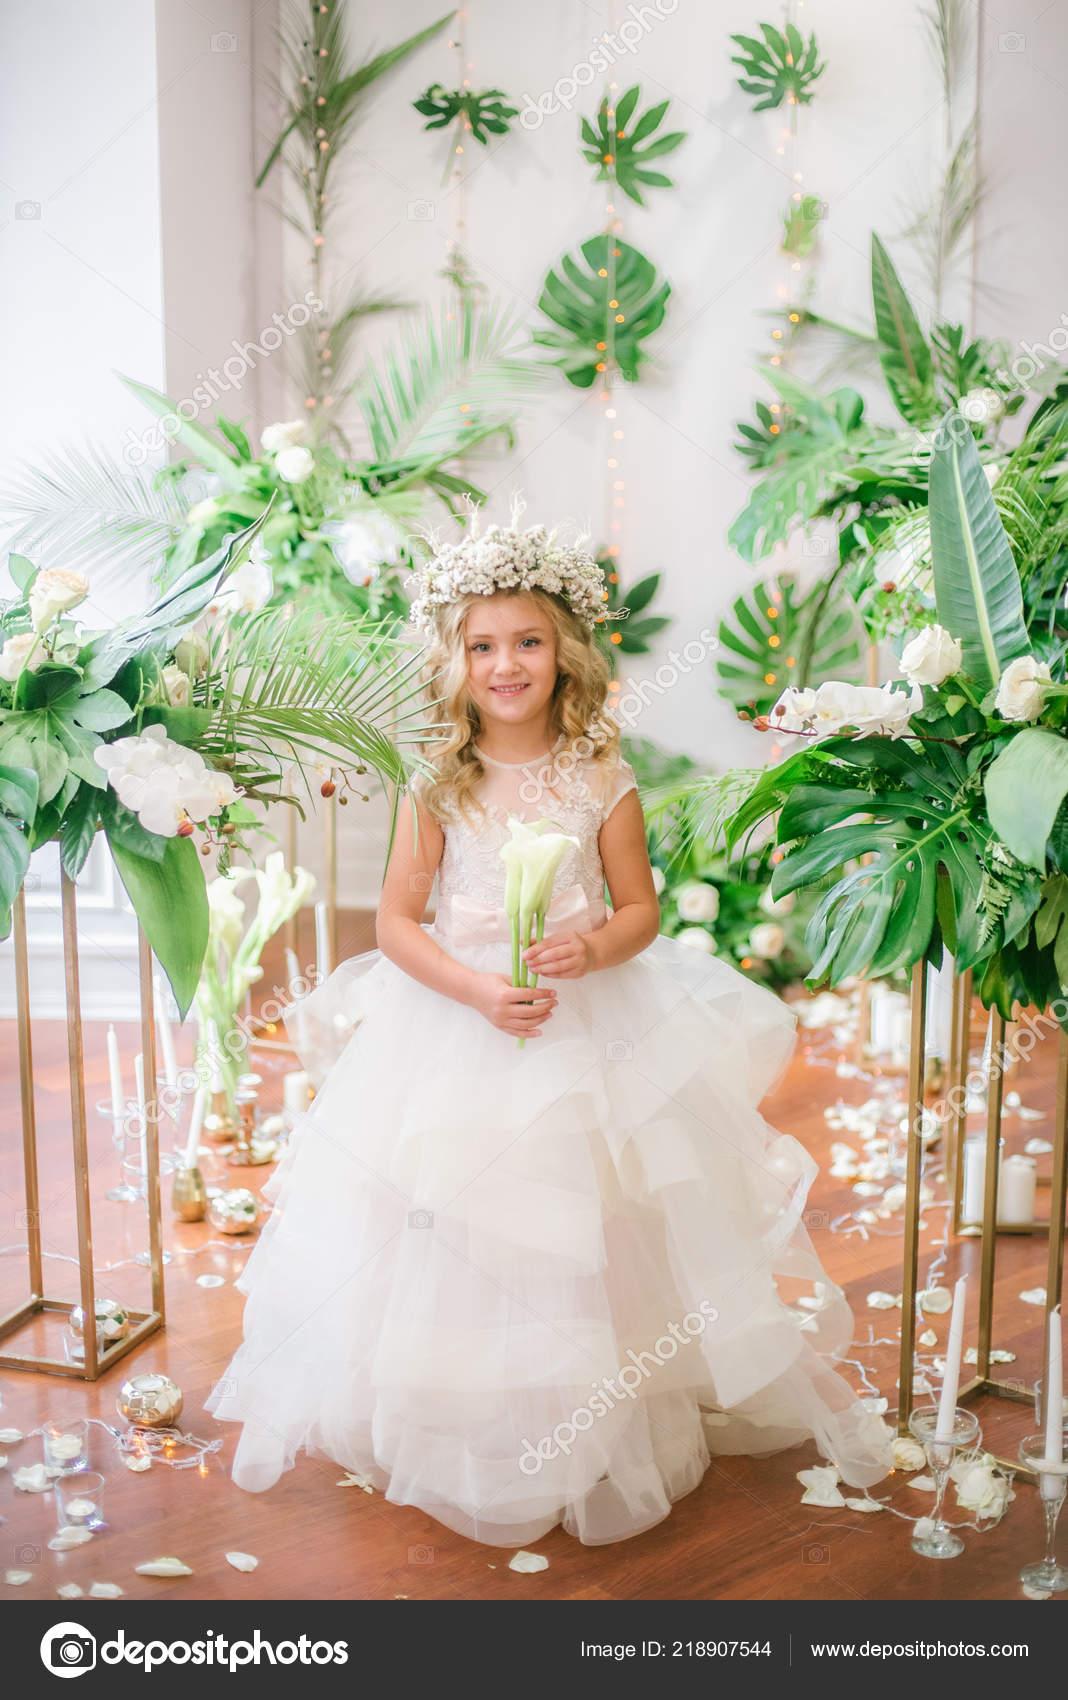 Cute Little Girl Blond Curly Hair White Wedding Dress Wreath